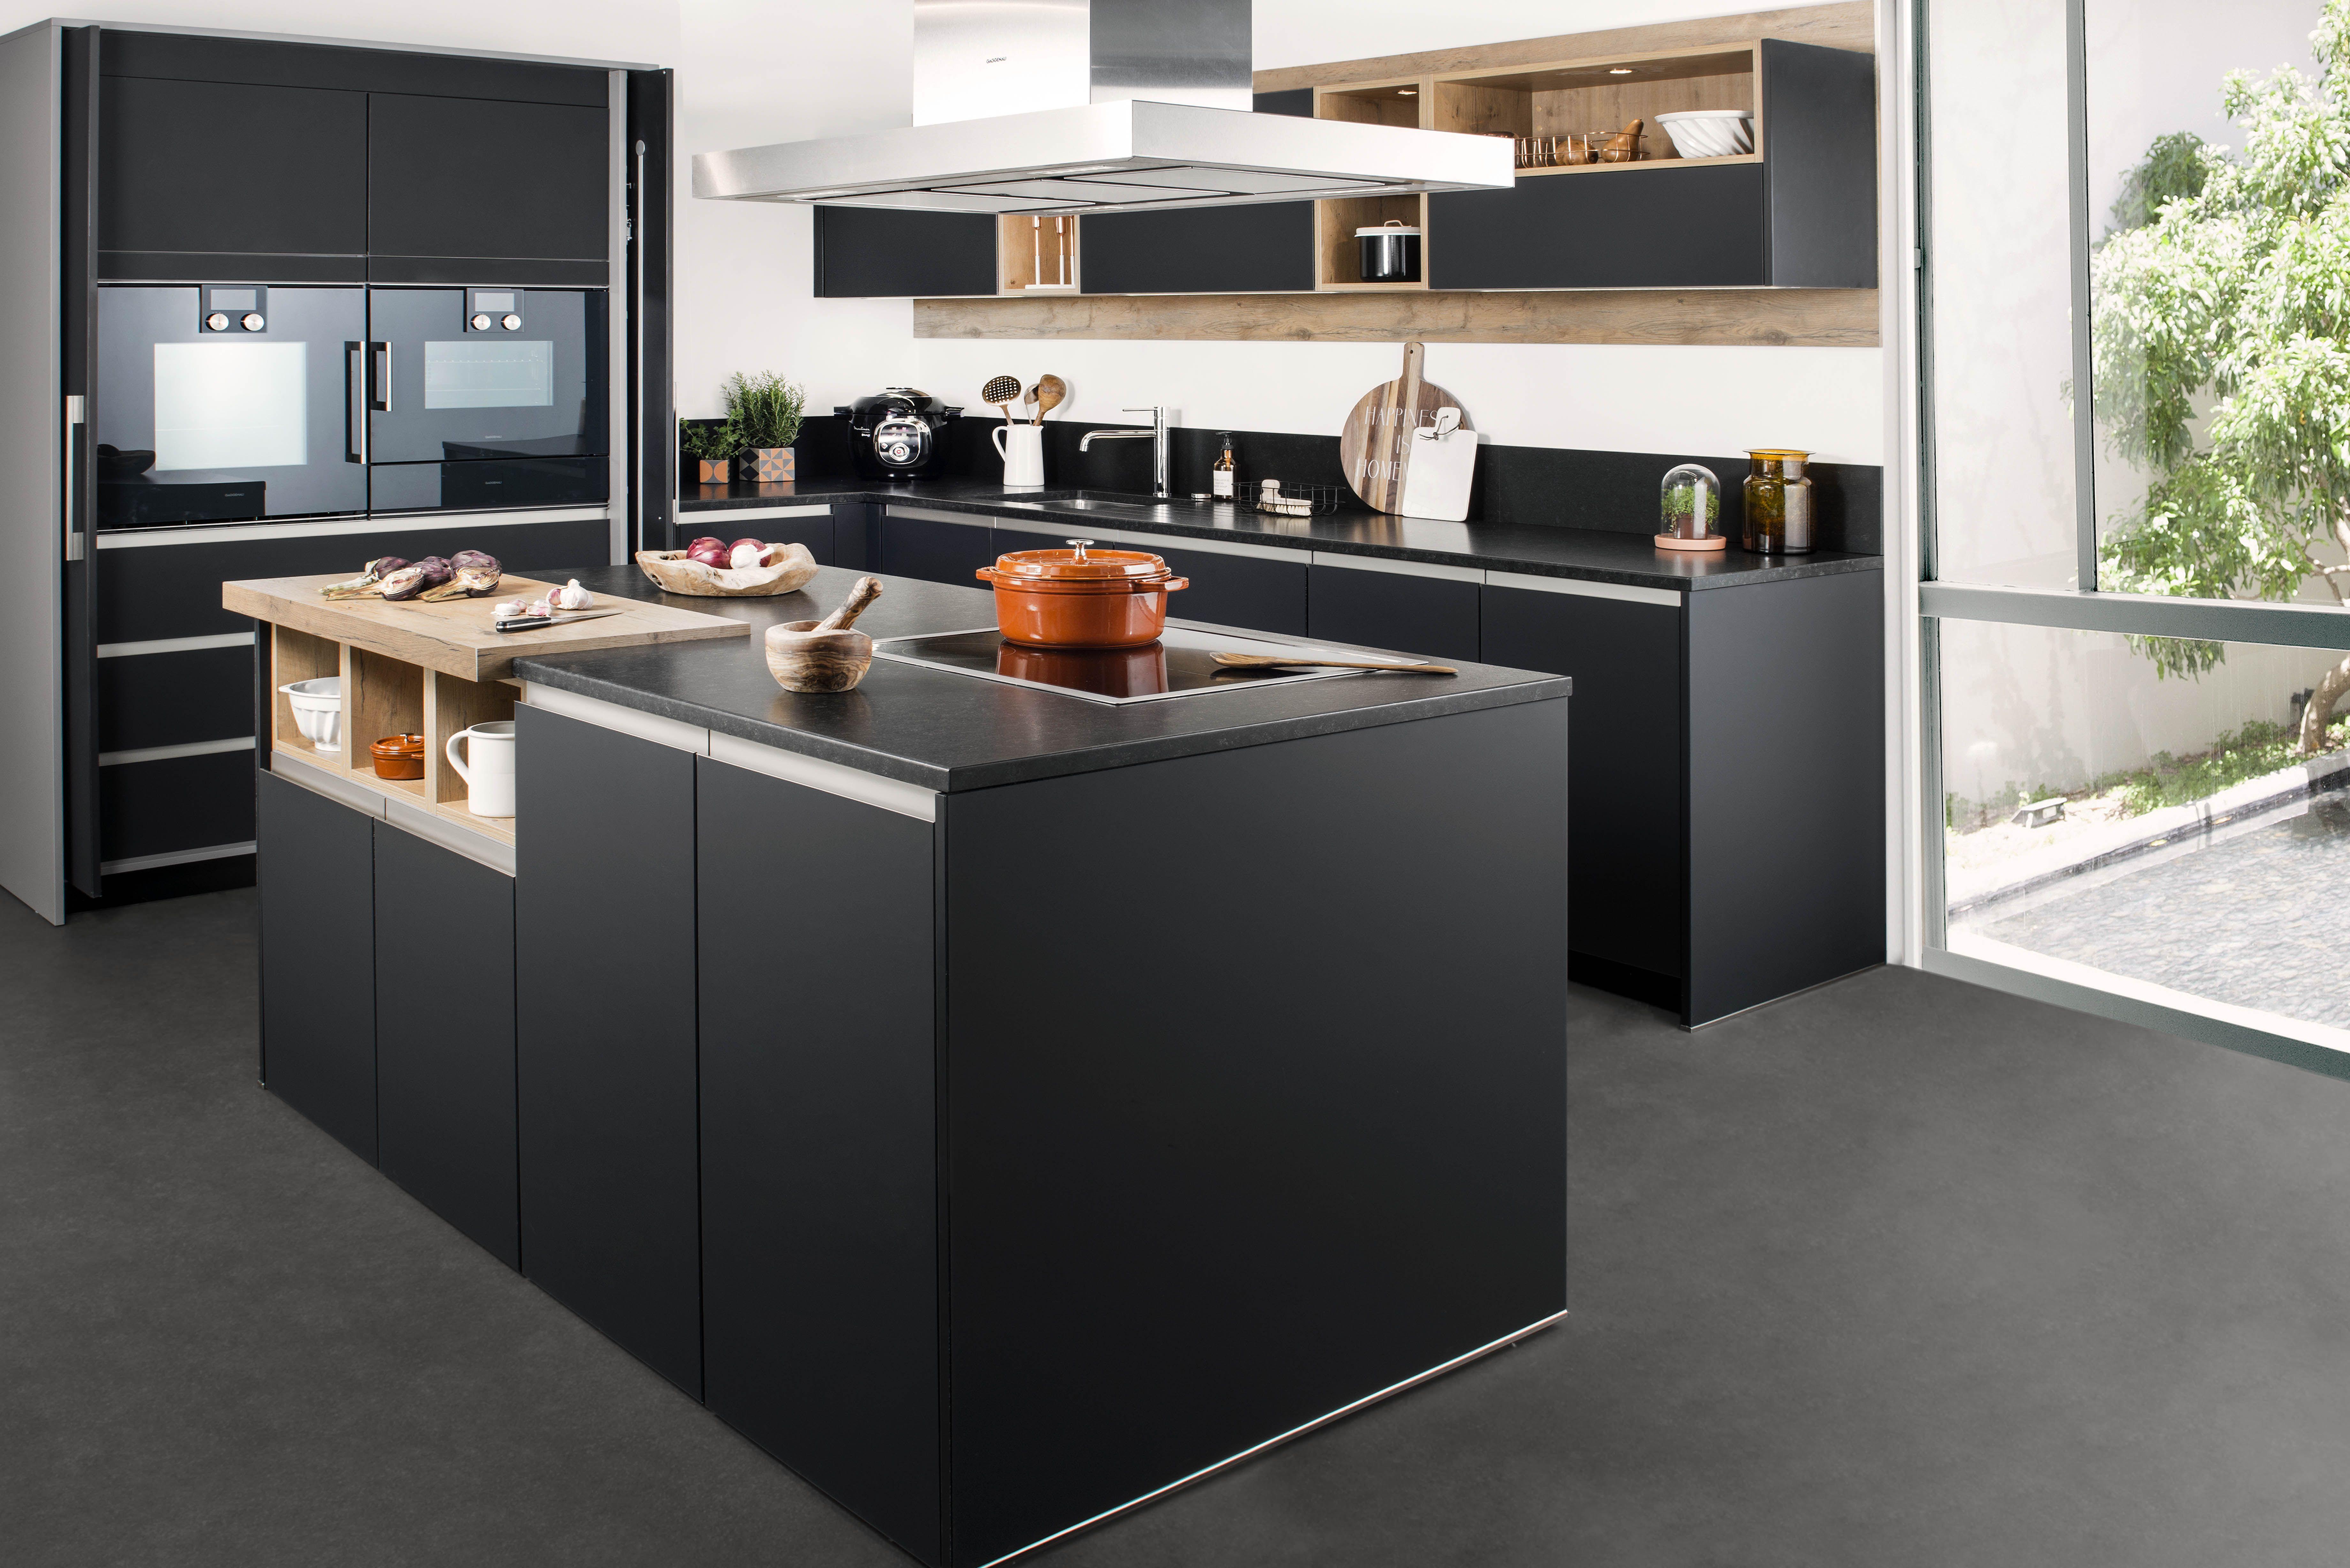 nova avec la fa ade nova vous avez une cuisine tr s. Black Bedroom Furniture Sets. Home Design Ideas